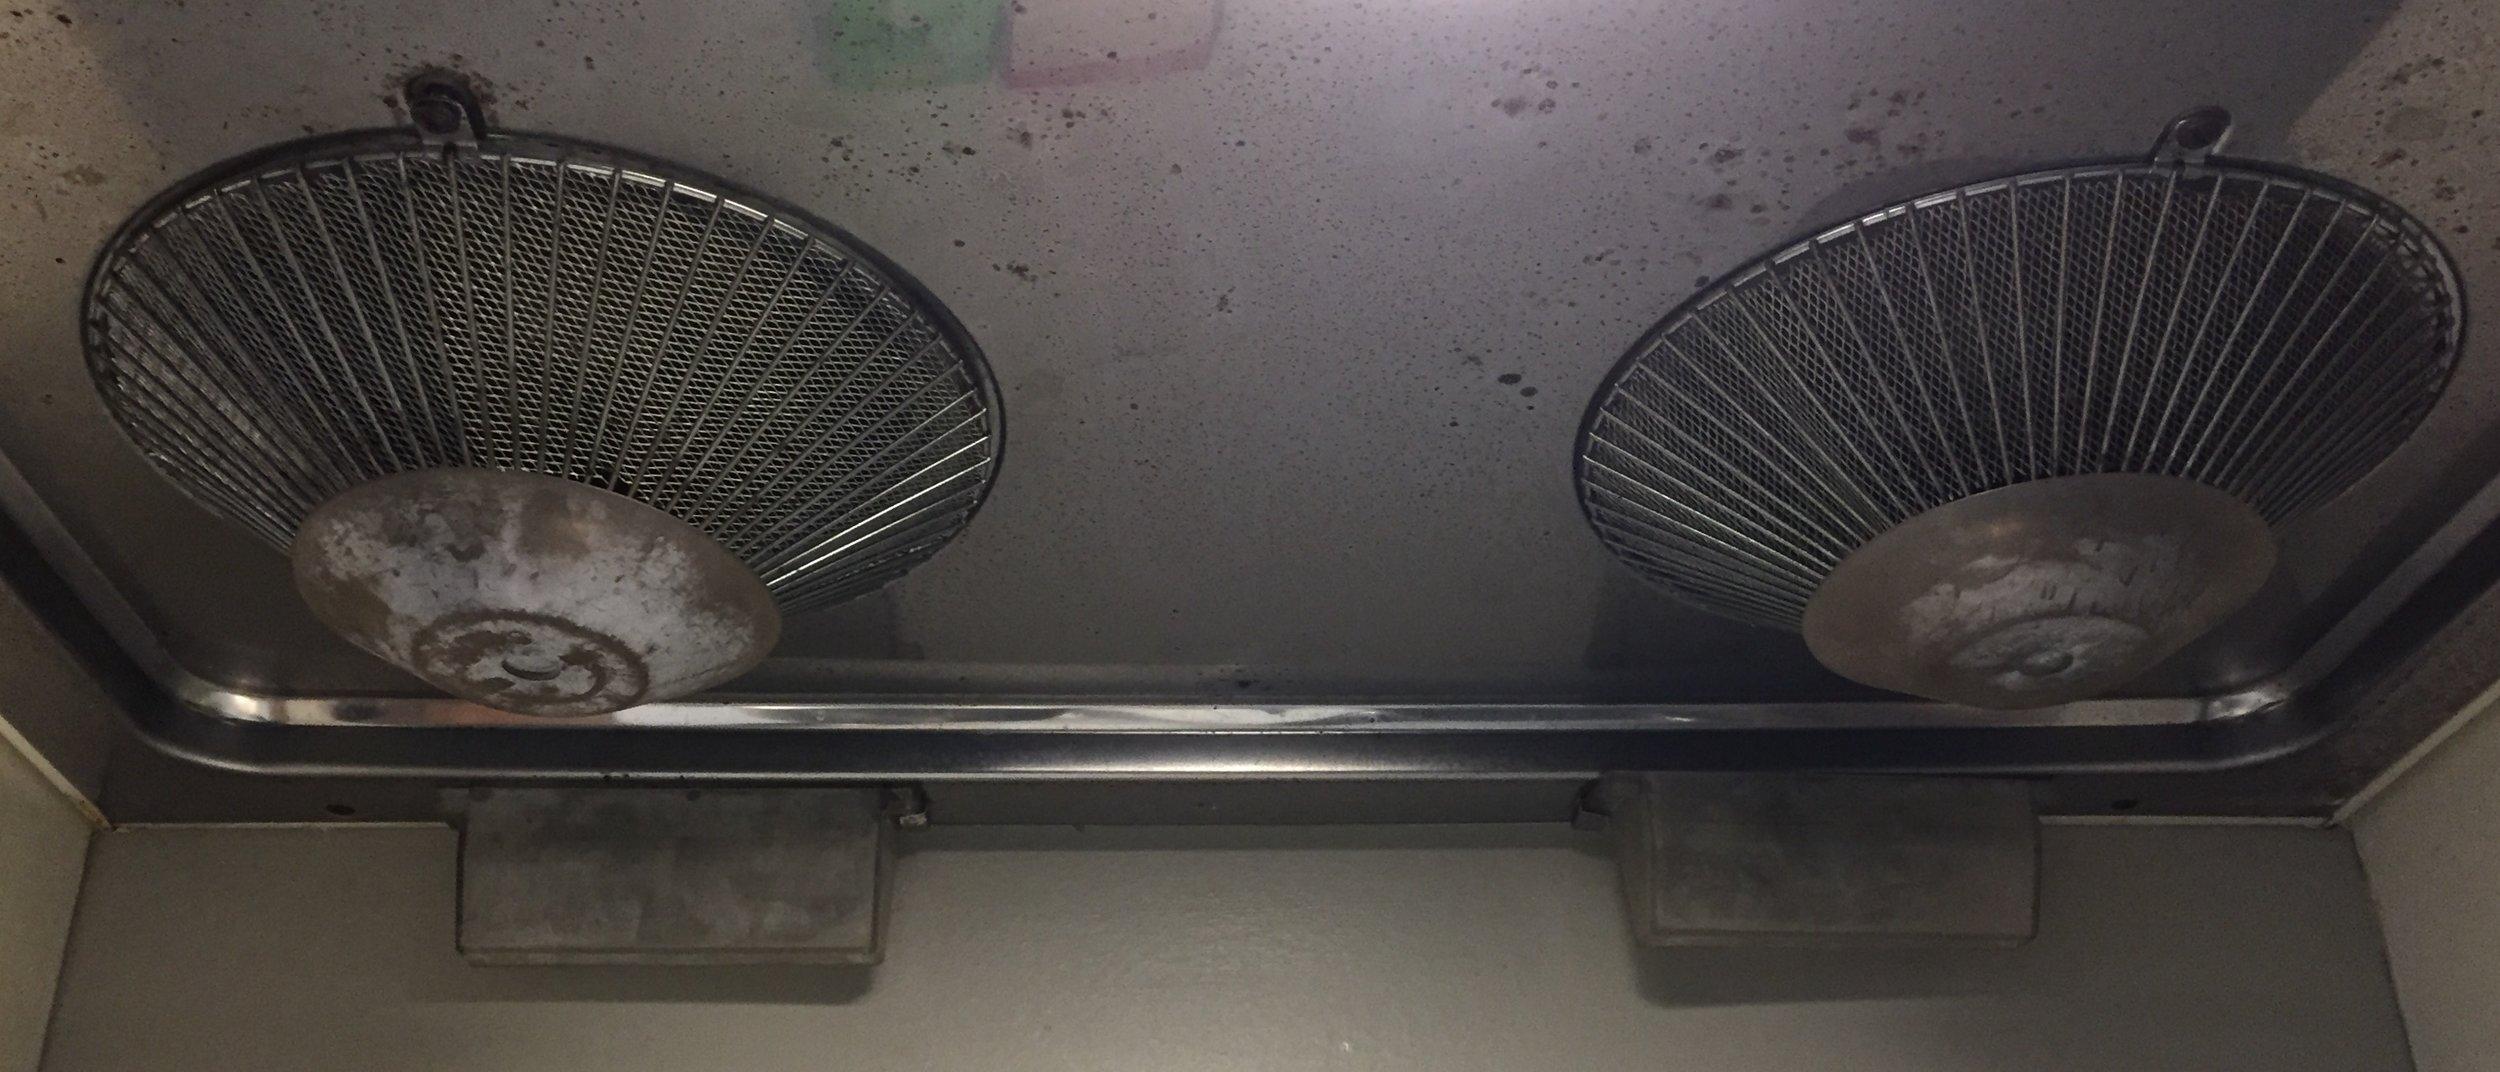 Range hood grease traps from below